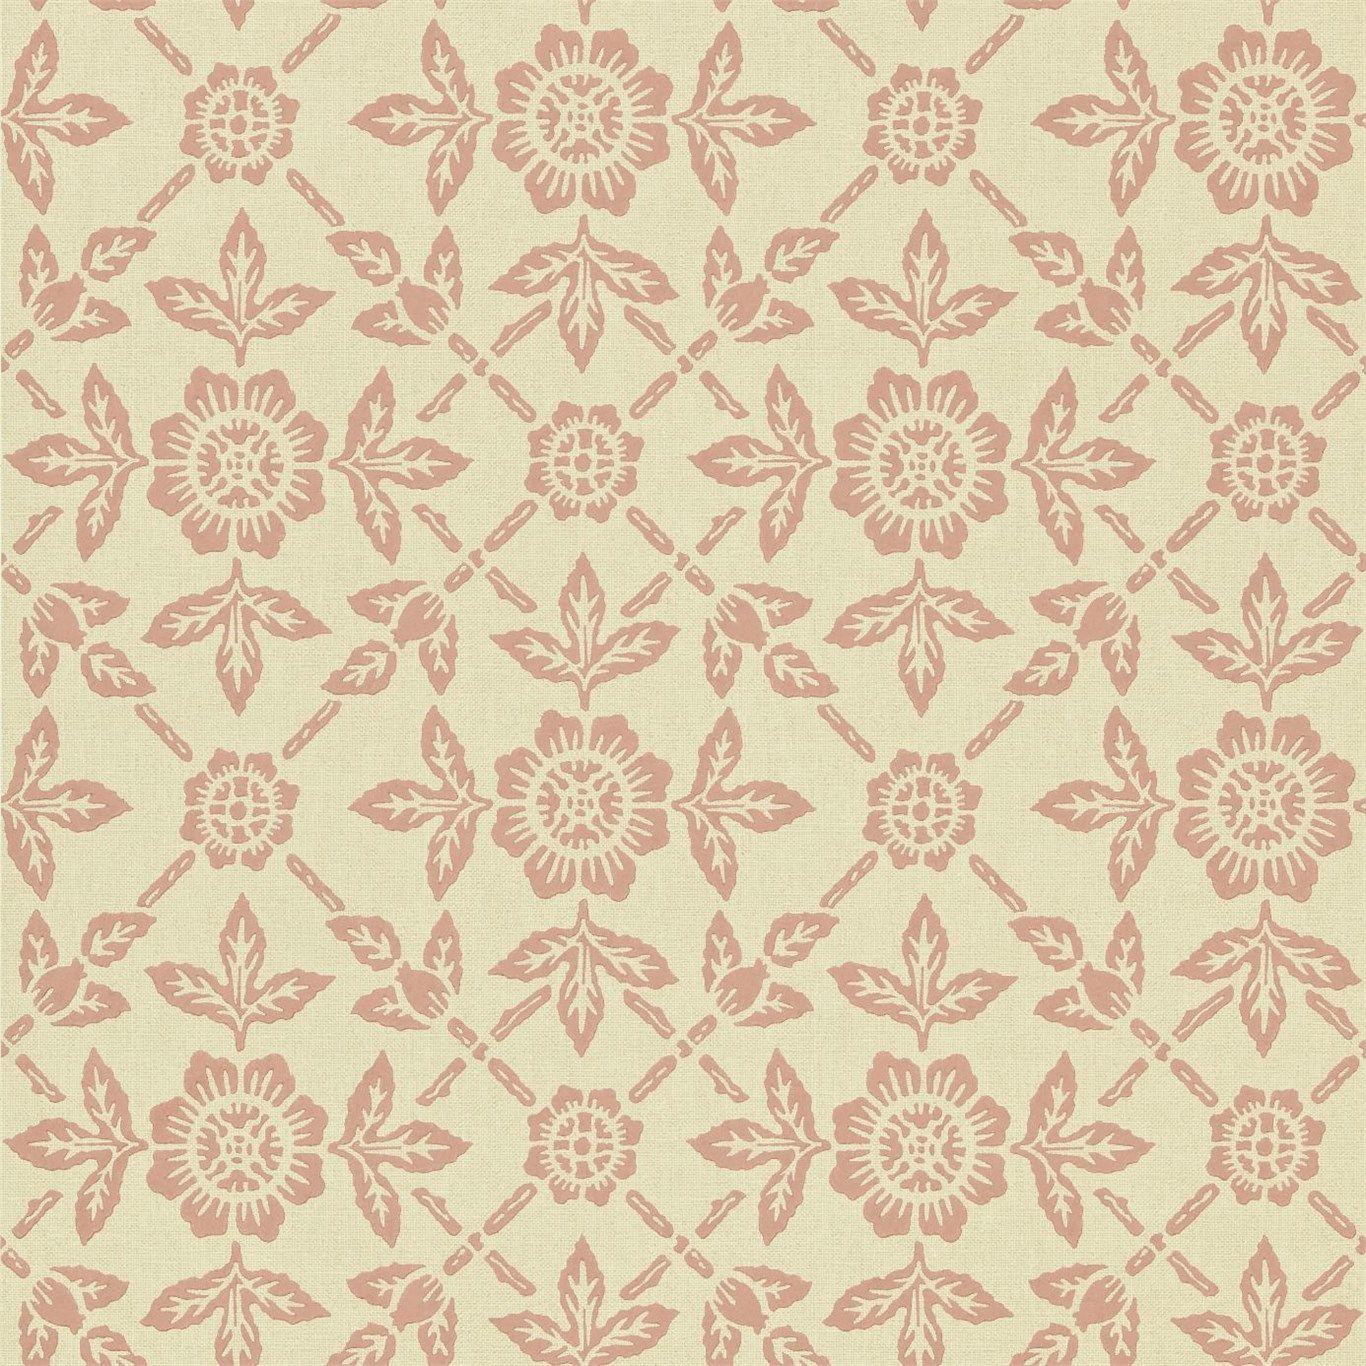 Zoffany wallpaper, Floral artwork ...